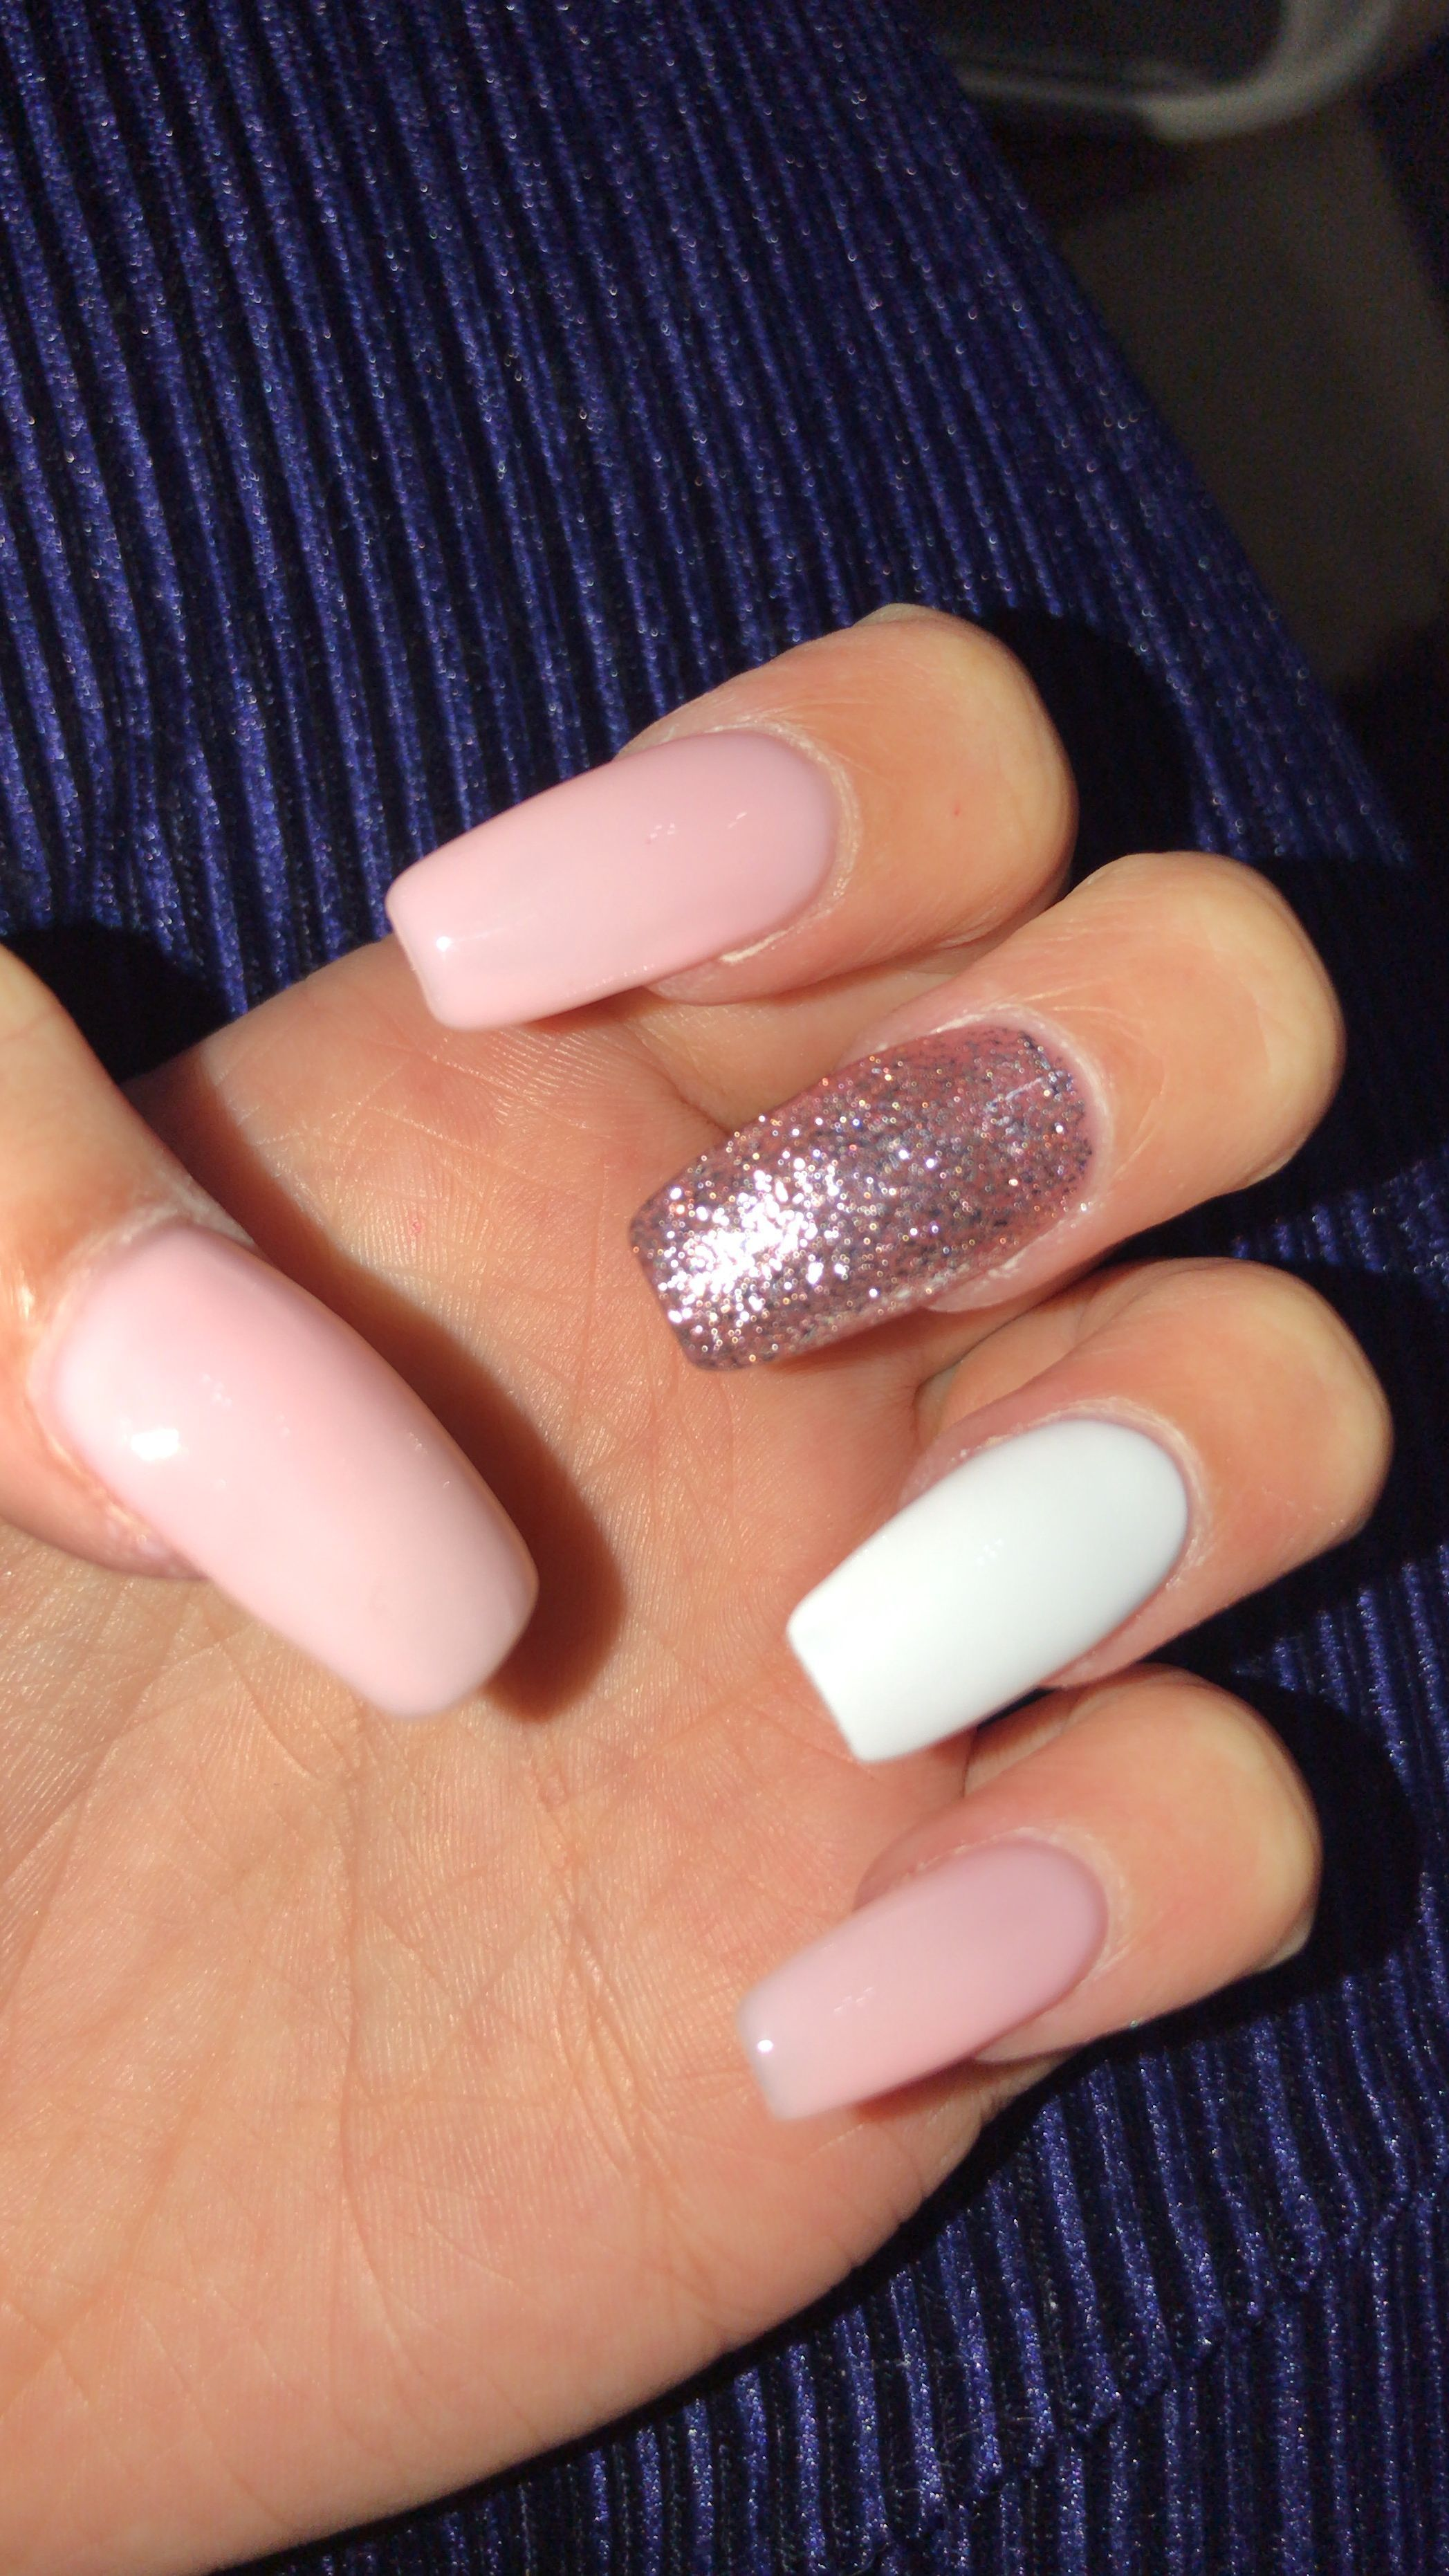 Pin By Hay Hay On Unas Pink Acrylic Nails Pale Pink Nails Pink Glitter Nails